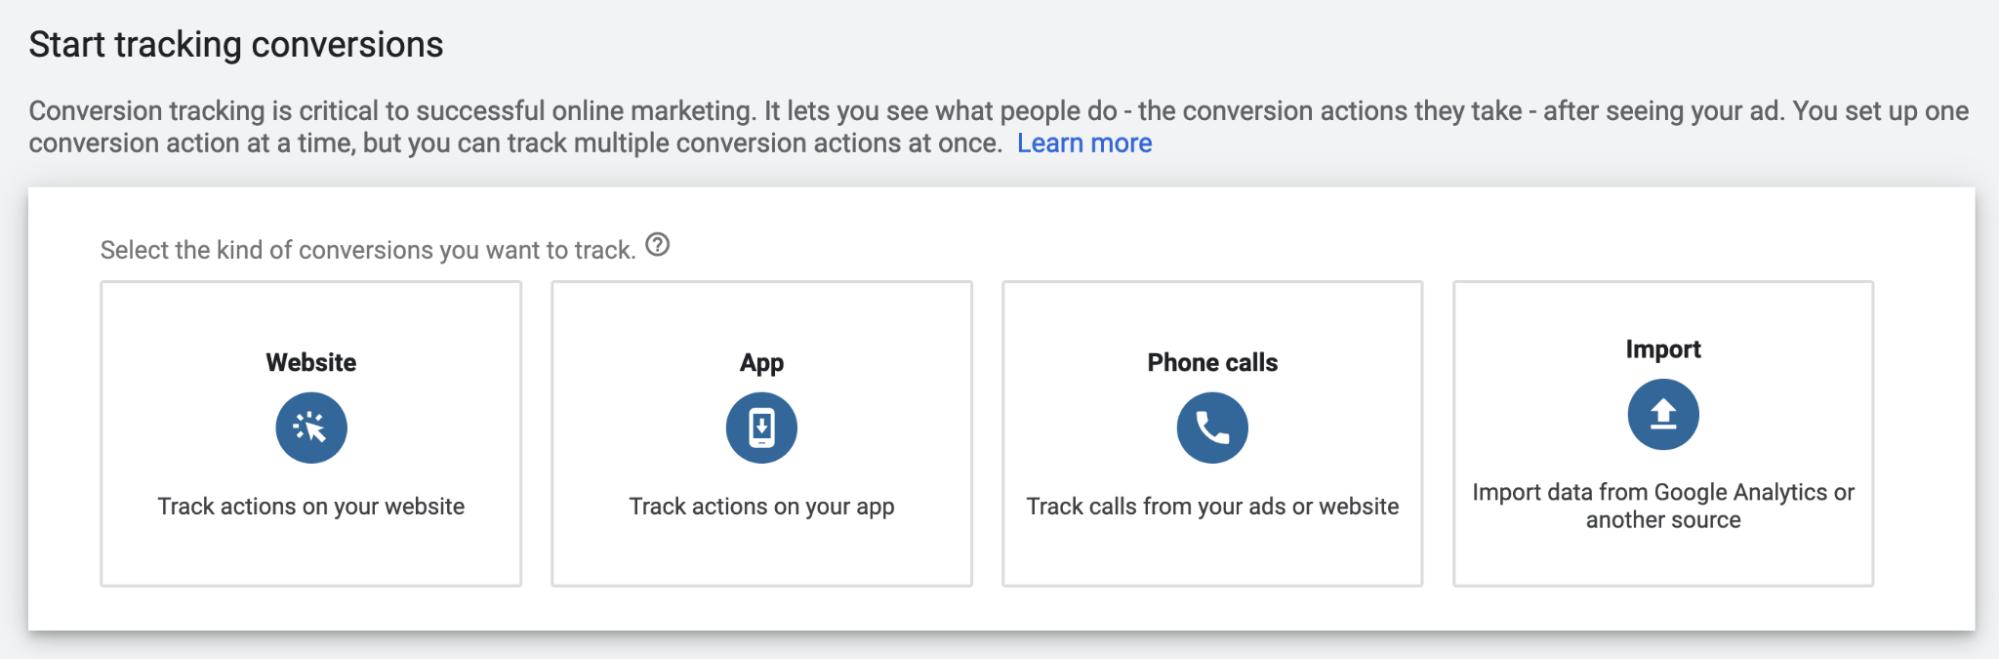 Google Ads Conversion Types